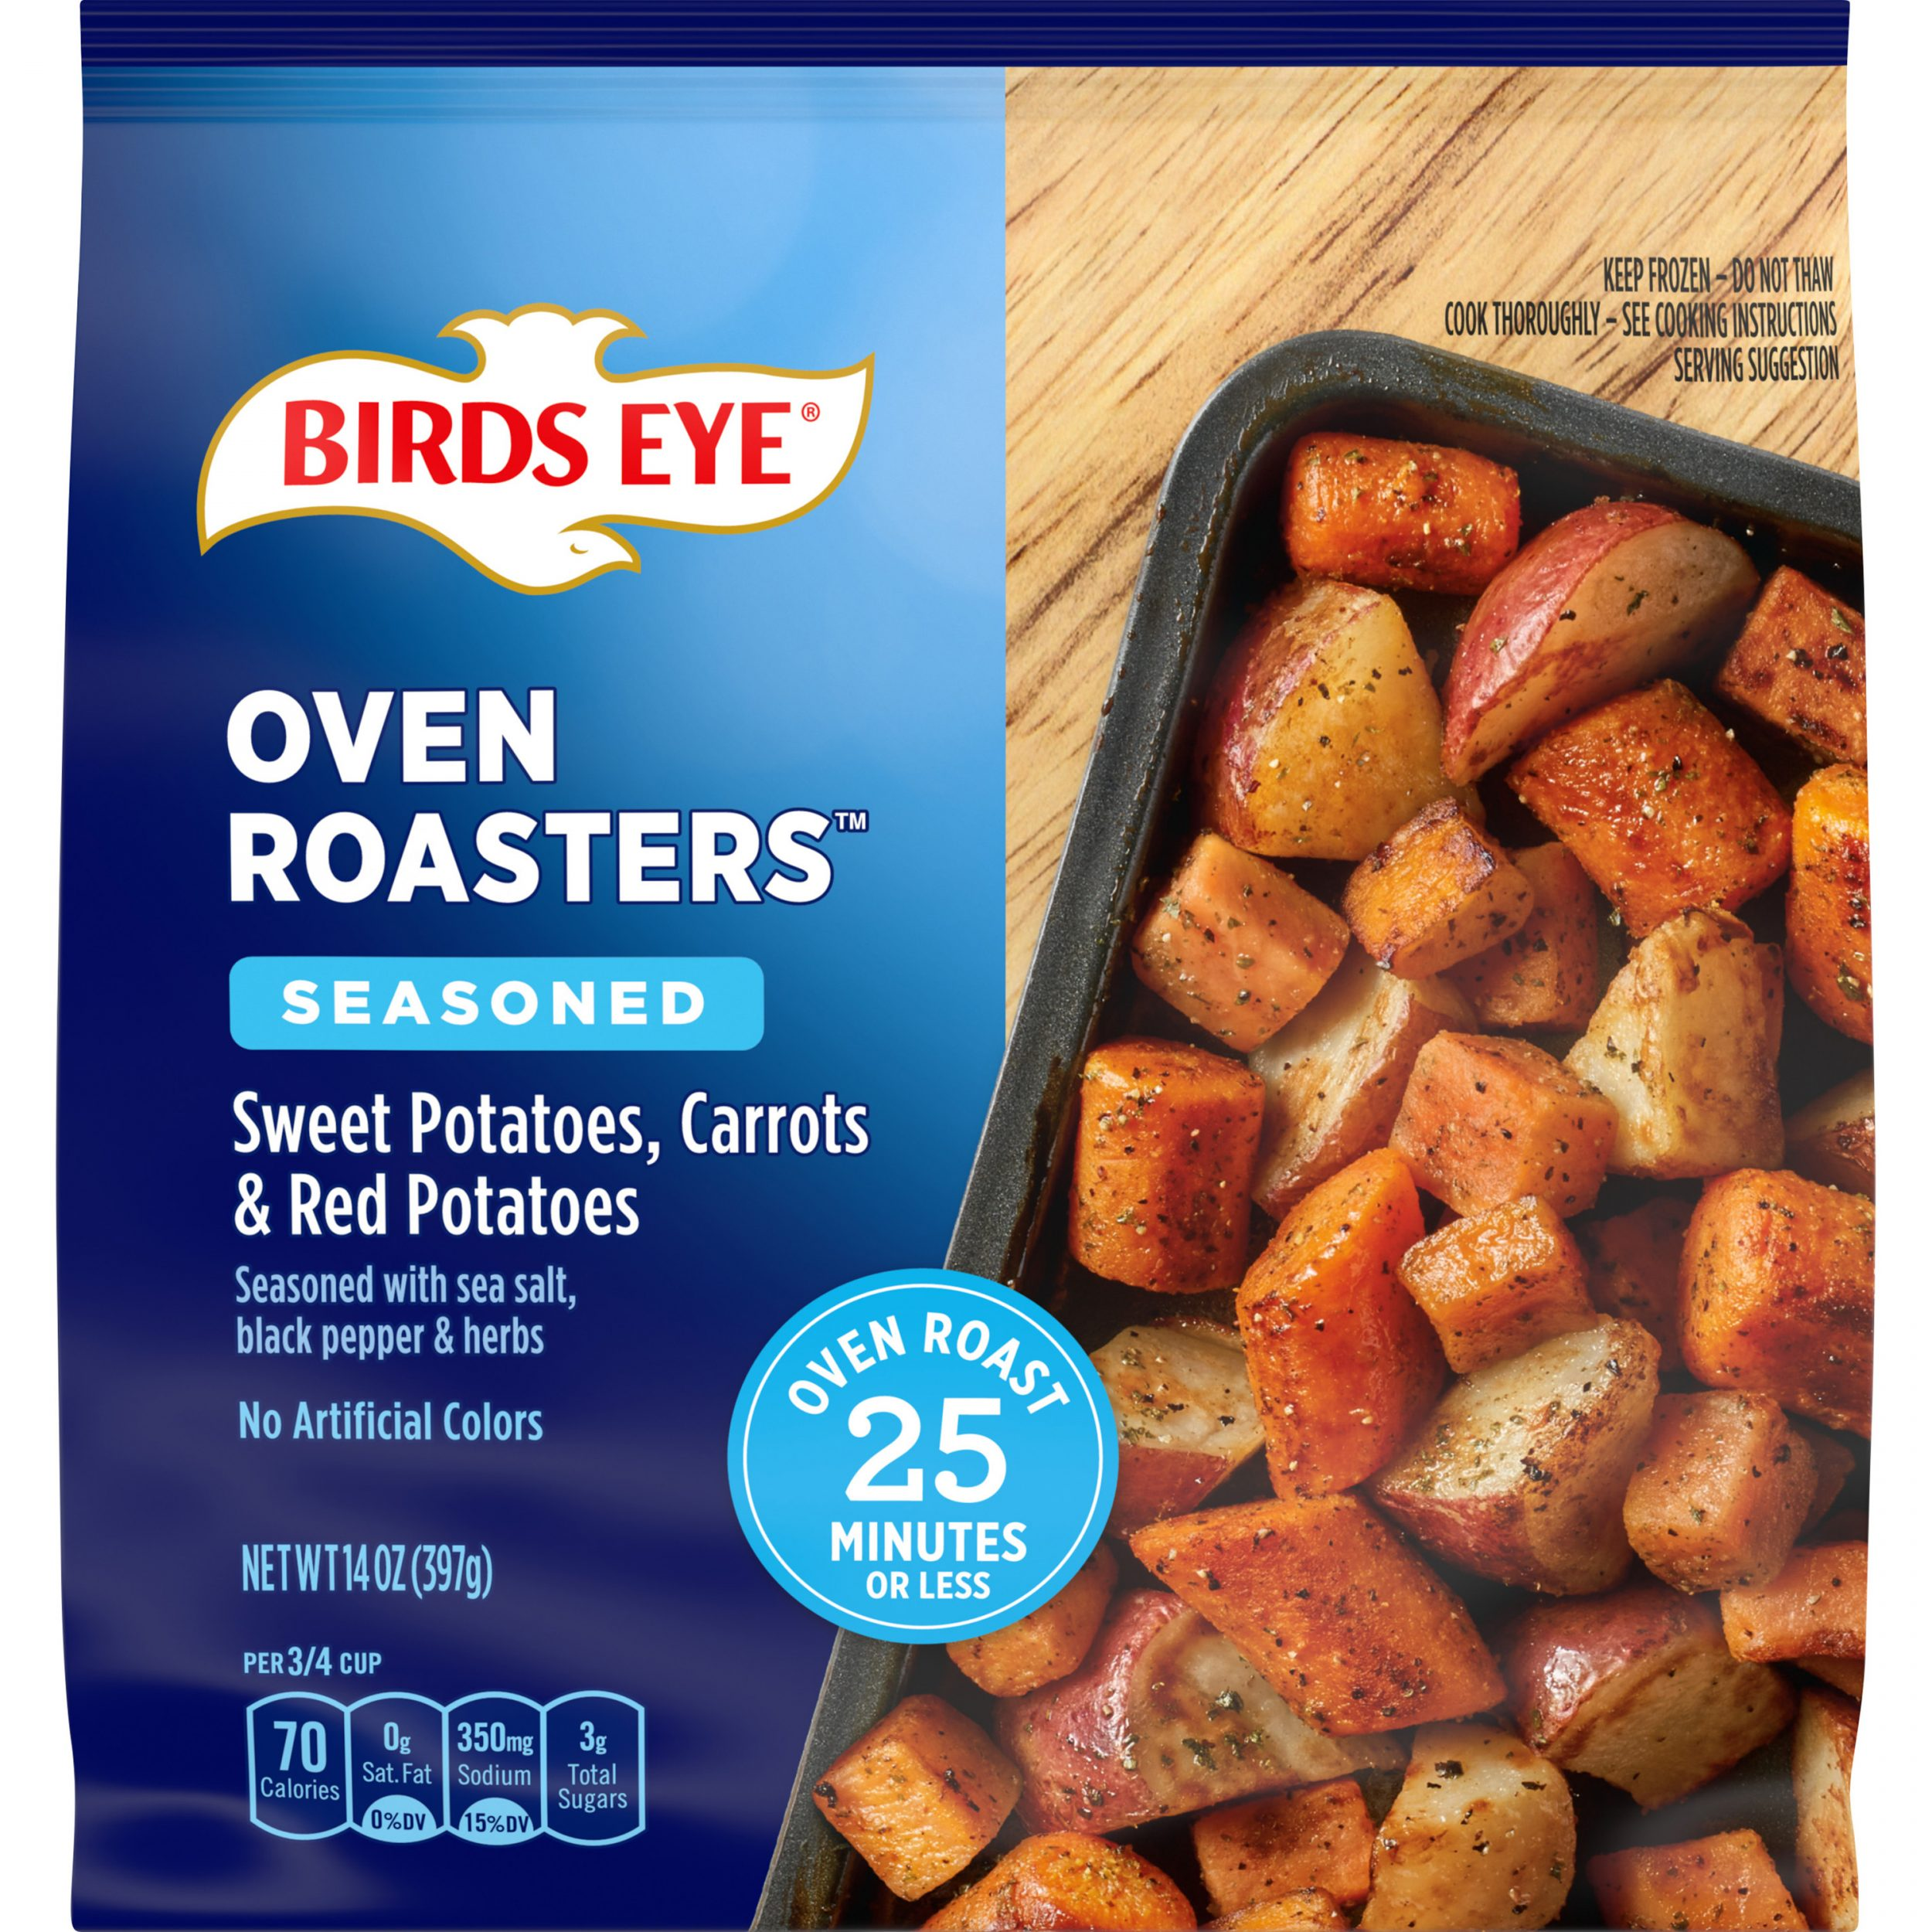 Birds Eye OvenRoasters™ Sheet Pan Vegetables Sweet Potatoes, Carrots & Red Potatoes